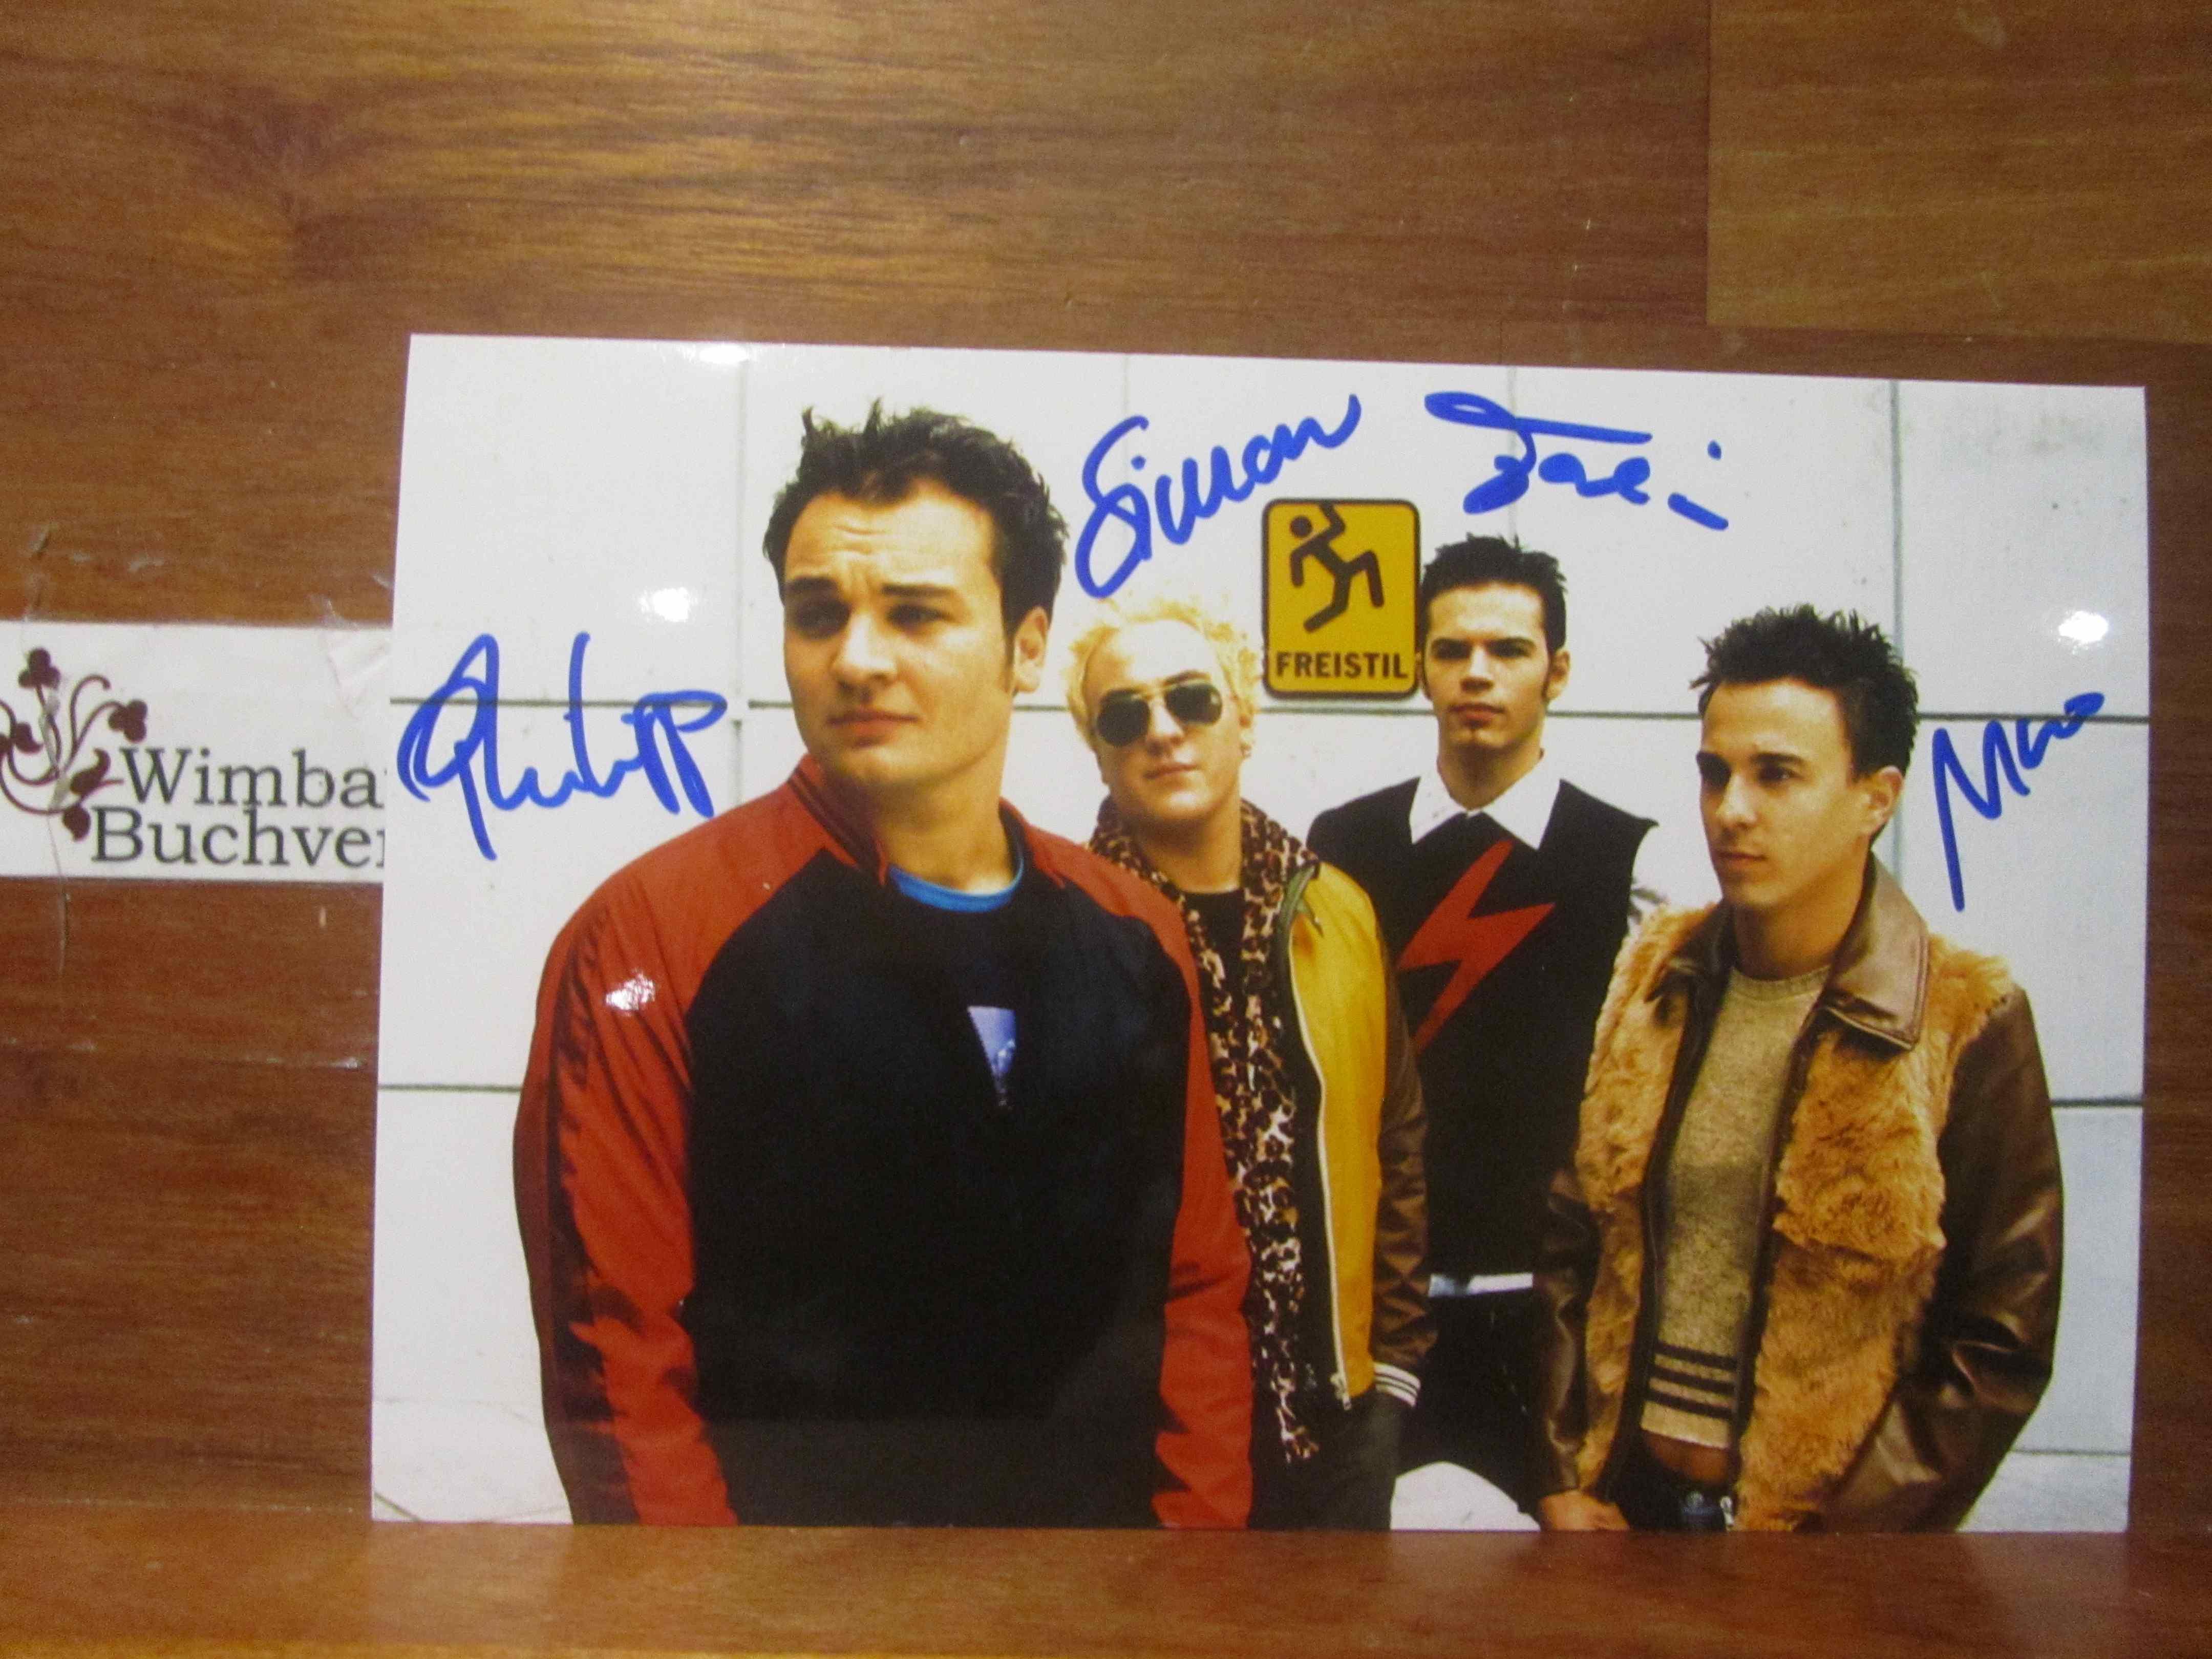 Original Autogramme Freistil (Band) /// Autogramm Autograph signiert signed signee